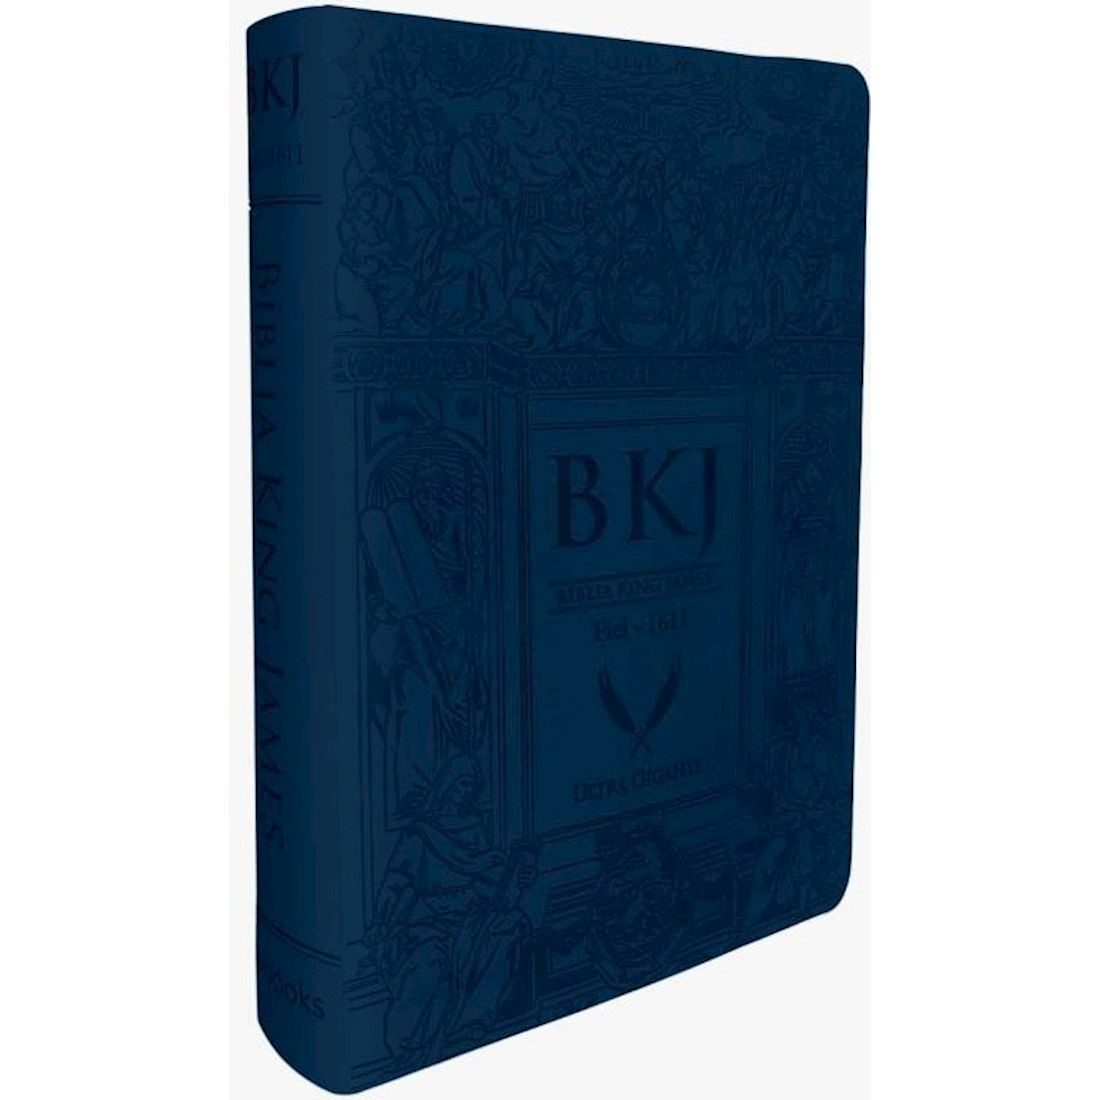 Bíblia King James Fiel 1611 Letra Ultra Gigante